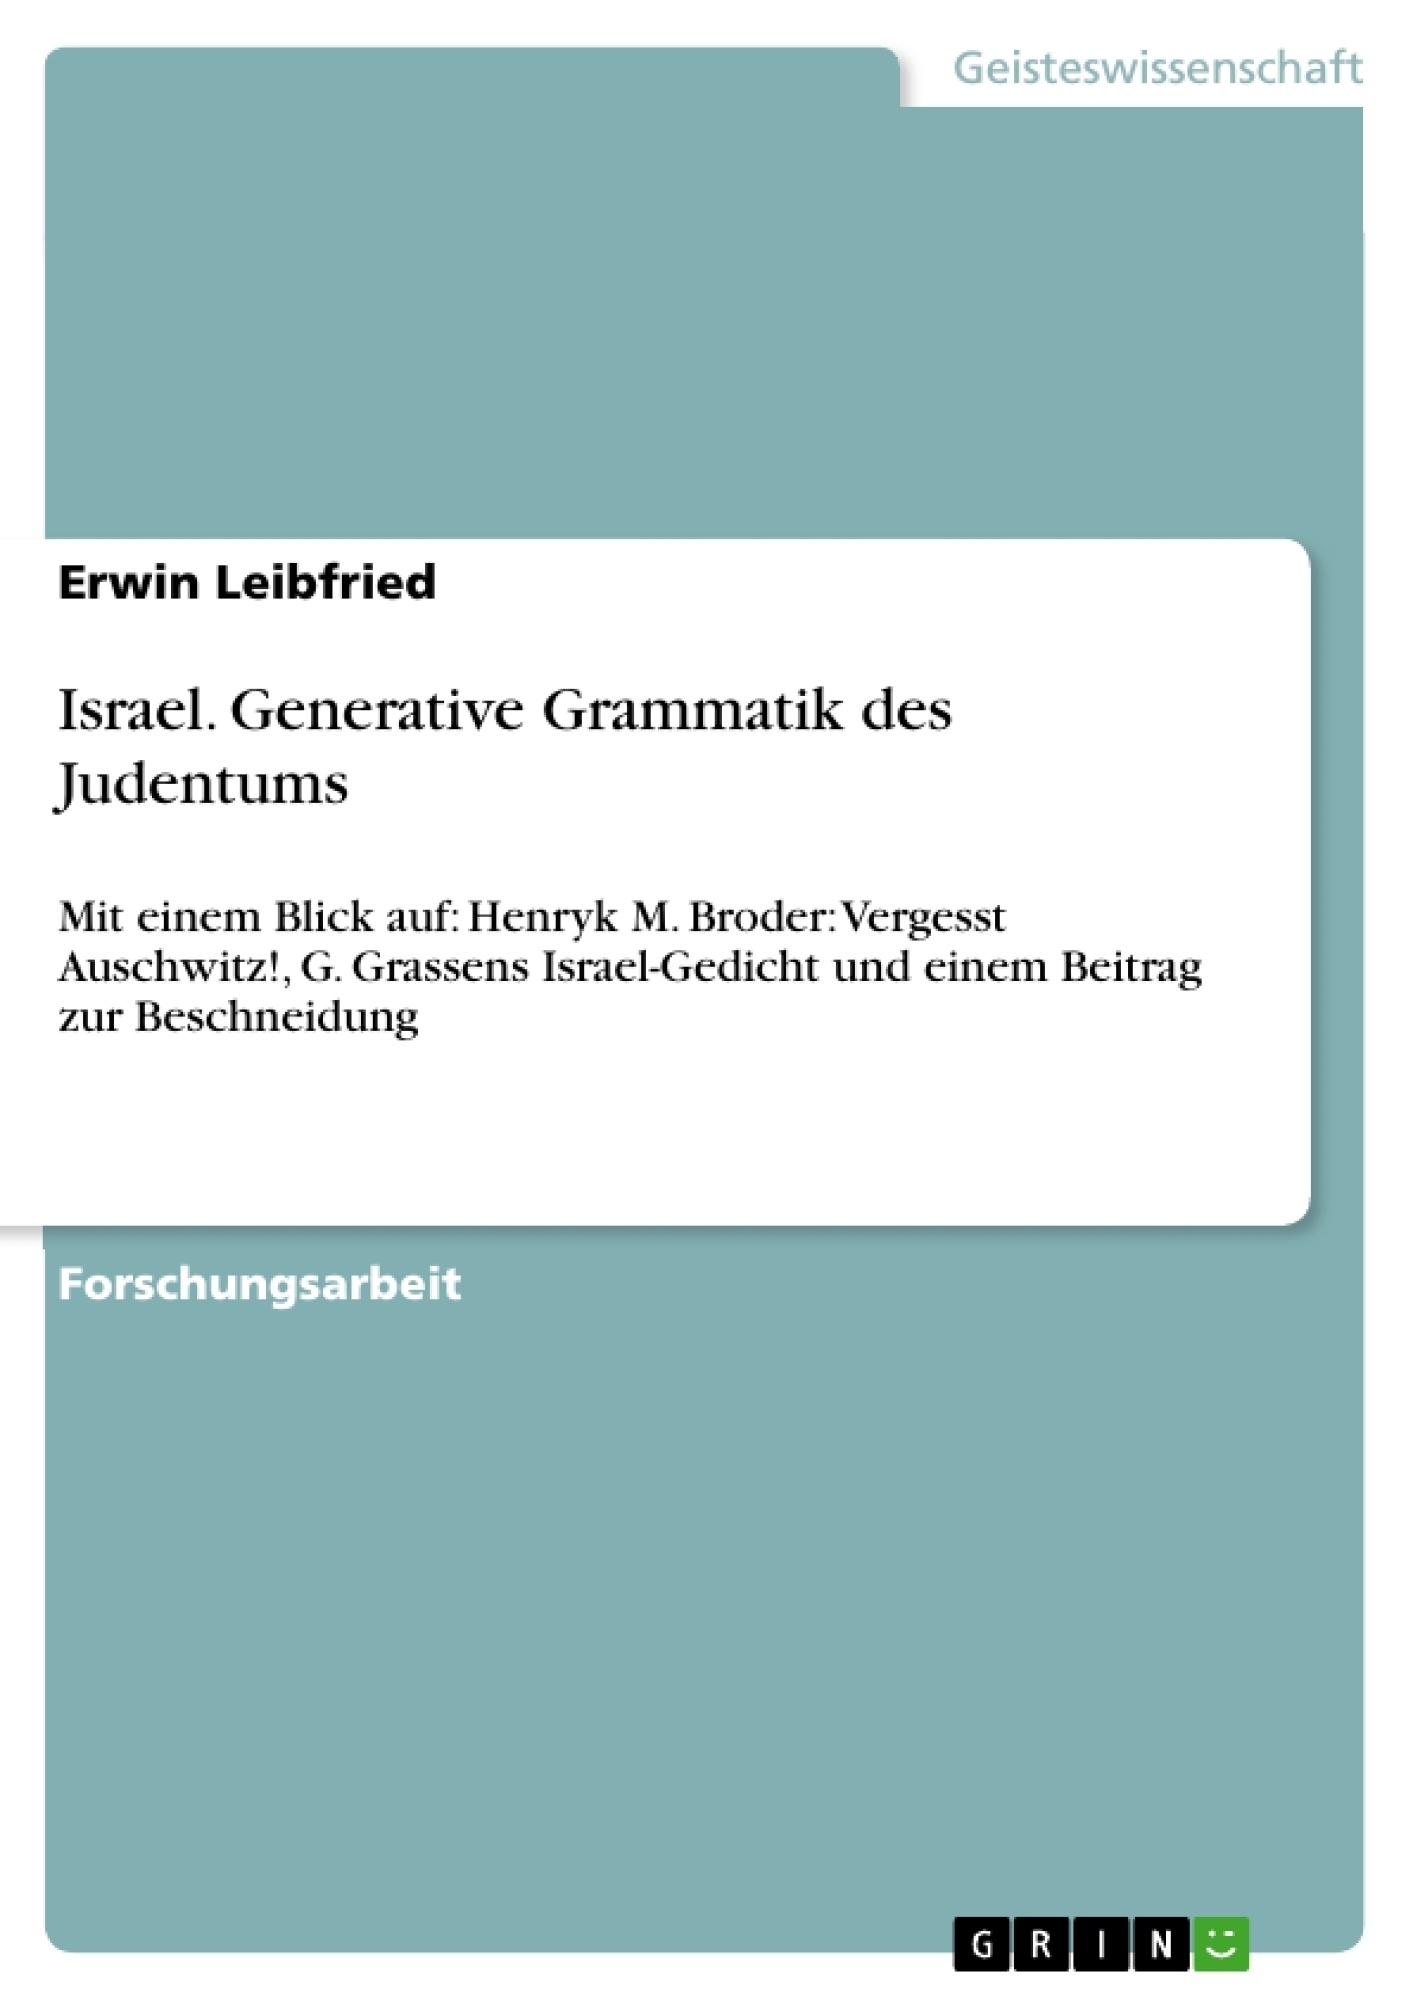 Titel: Israel. Generative Grammatik des Judentums